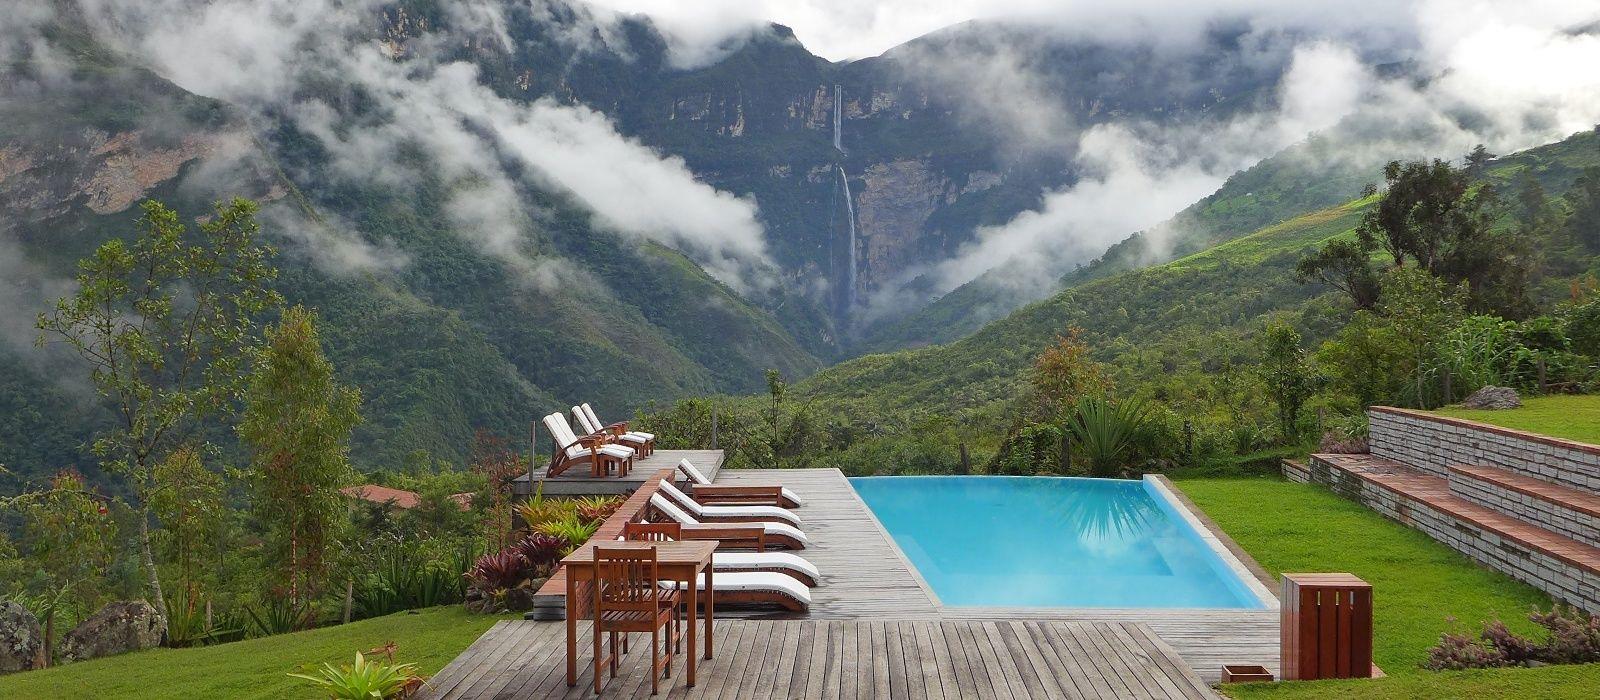 Peru: Mysteries of the Cloud Warriors Tour Trip 4